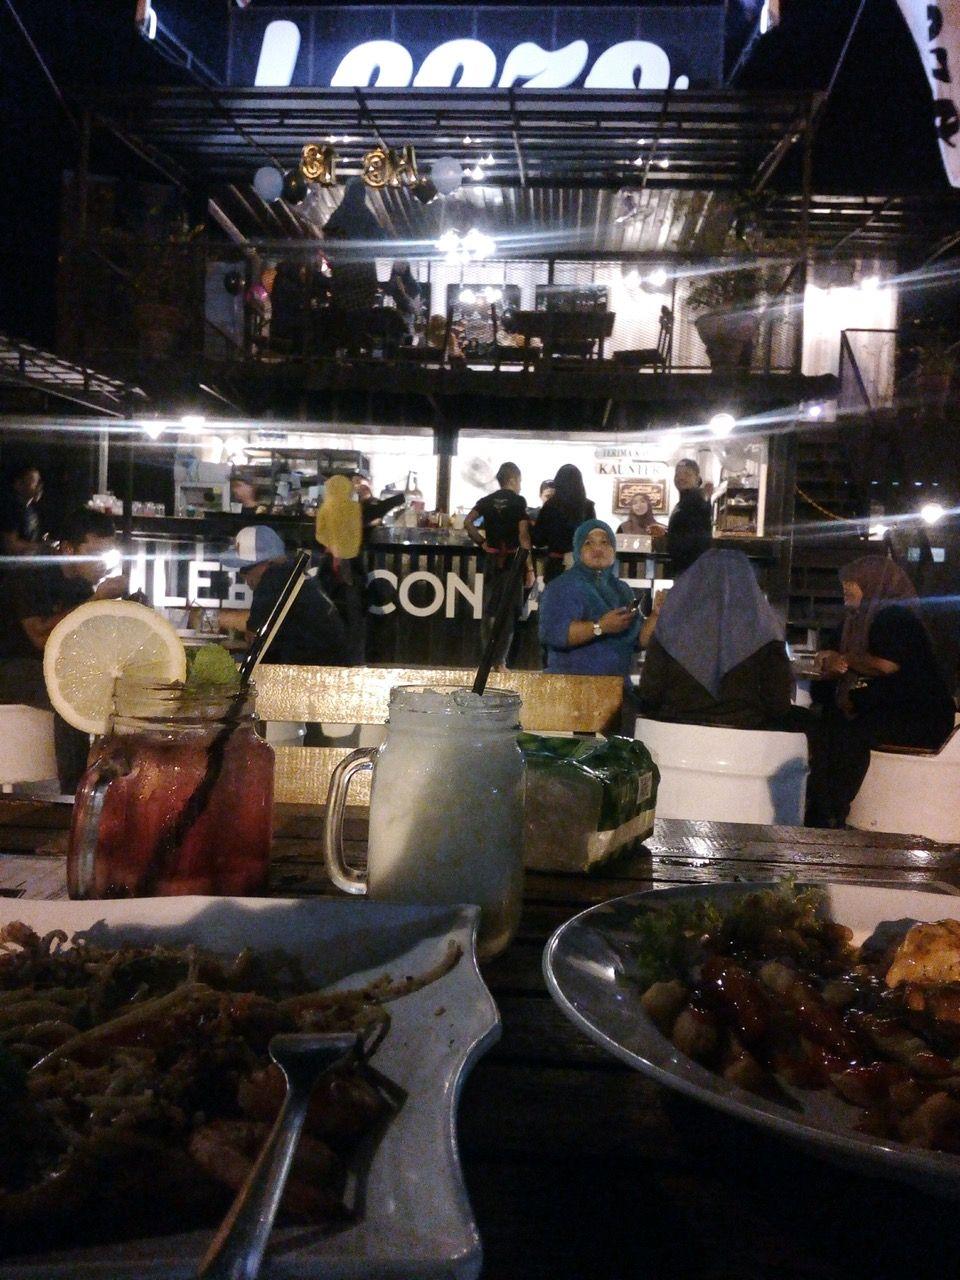 Photos à Leezo Container Restaurant à Batu Pahat Batu